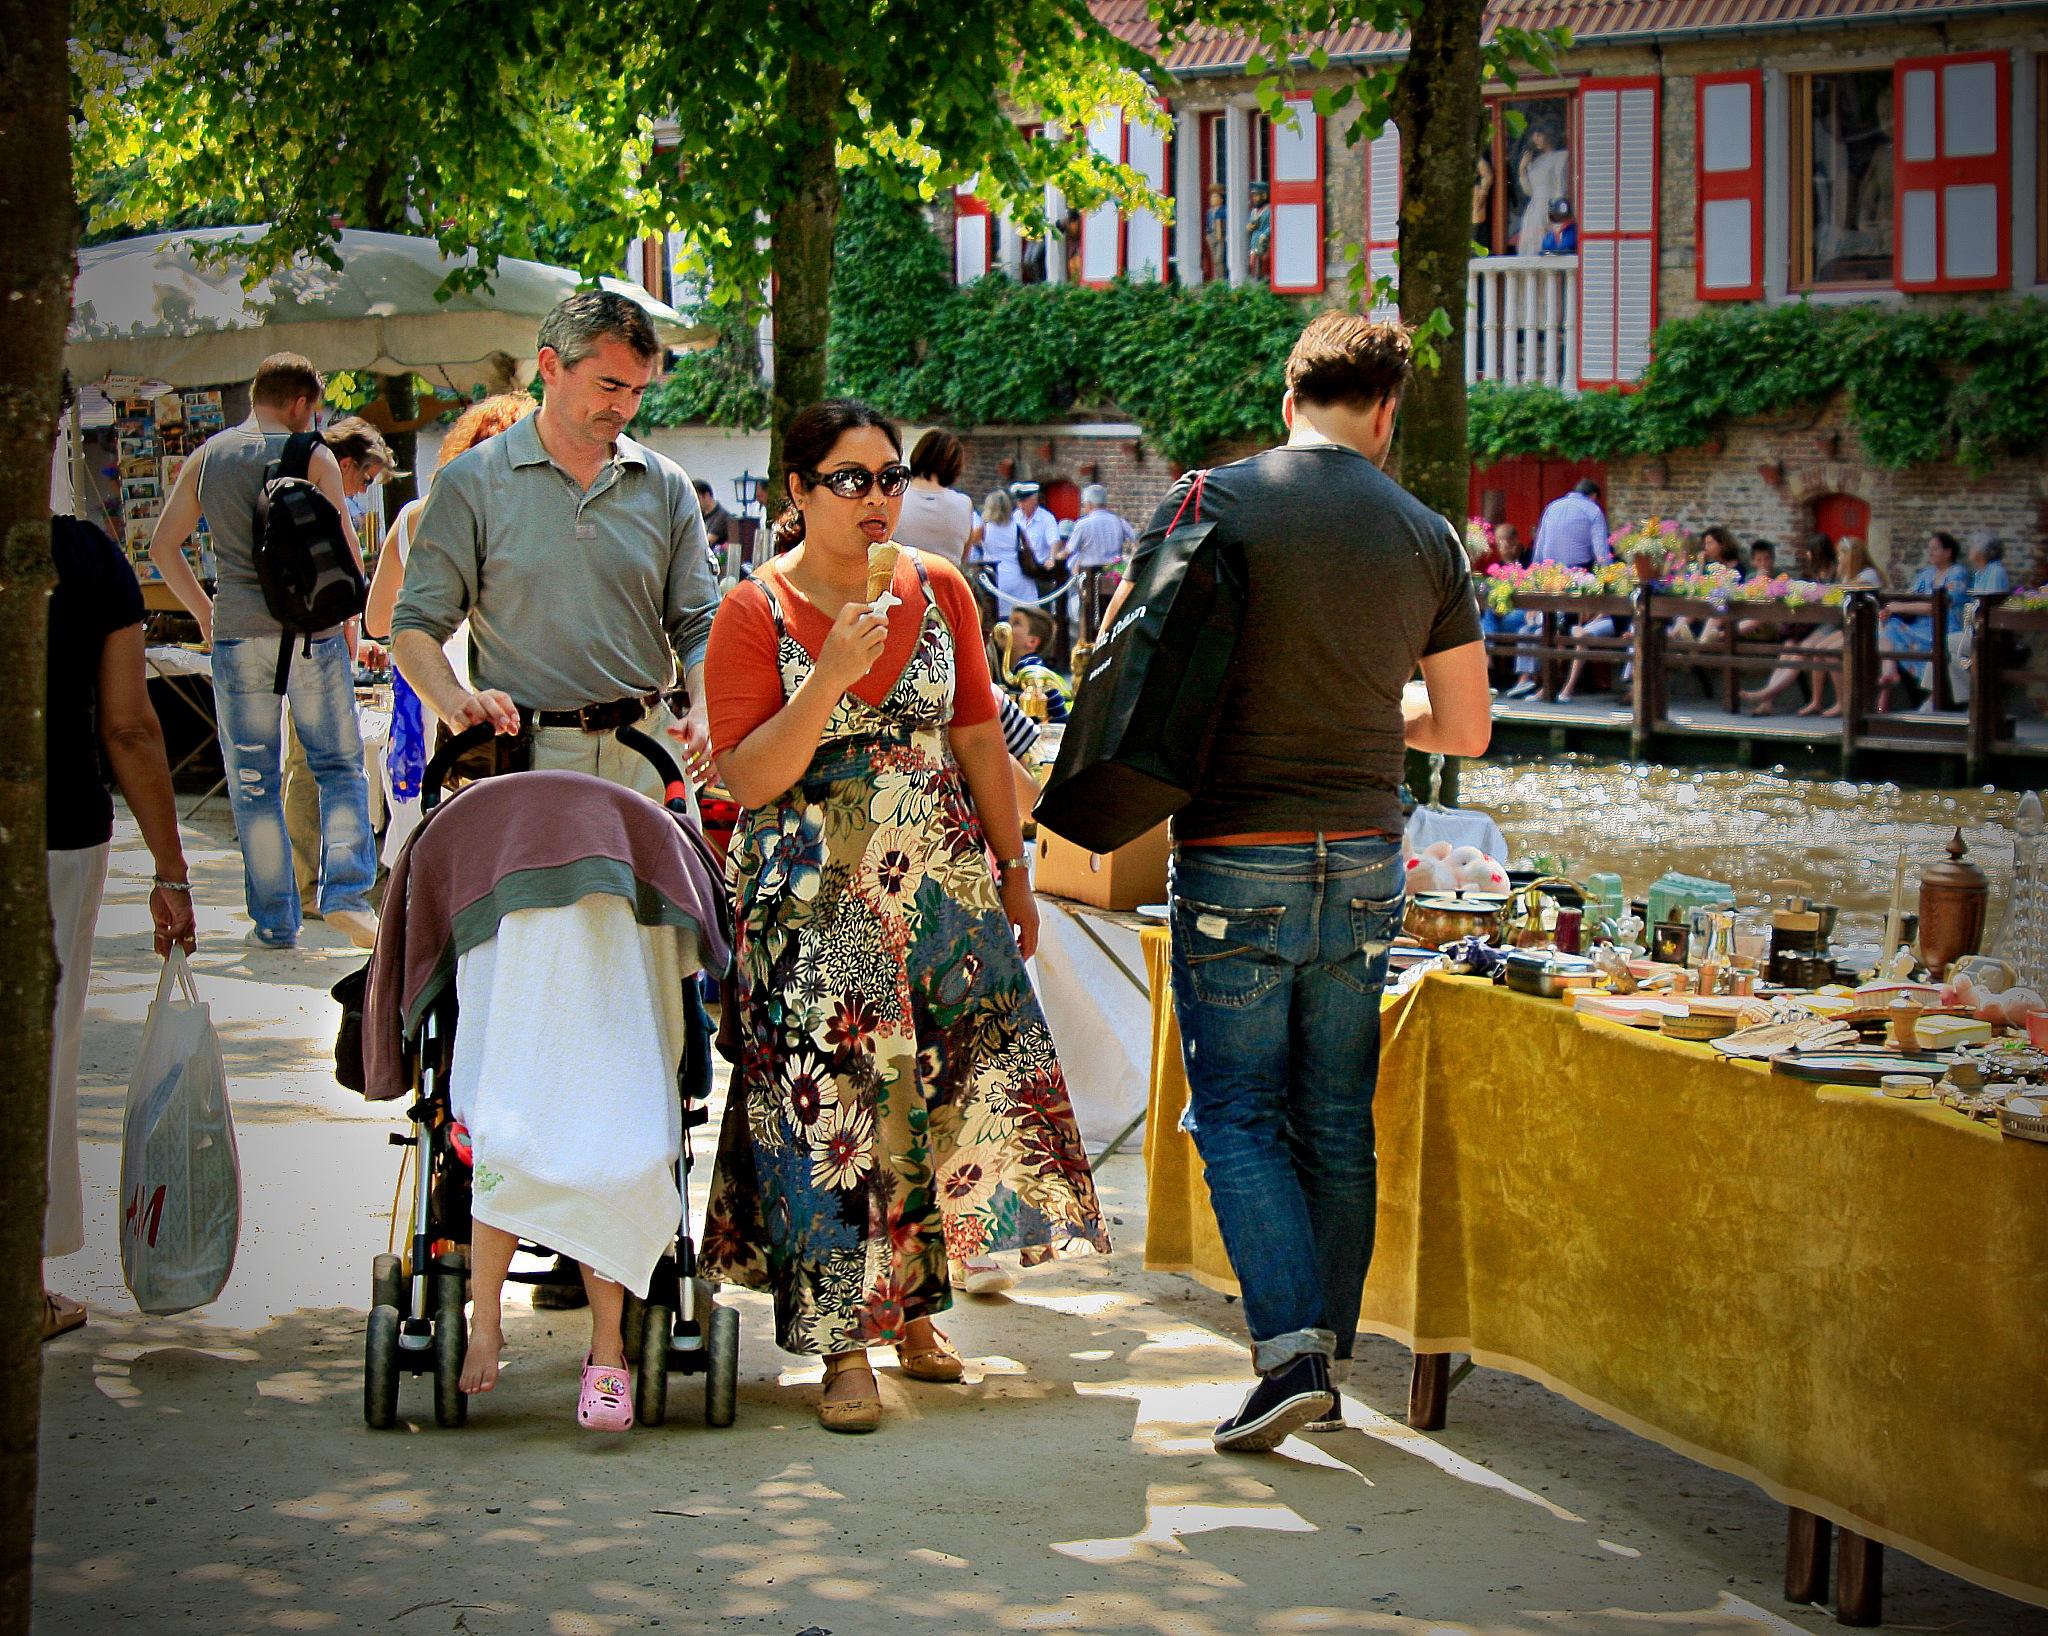 straatfotografie by Renaat